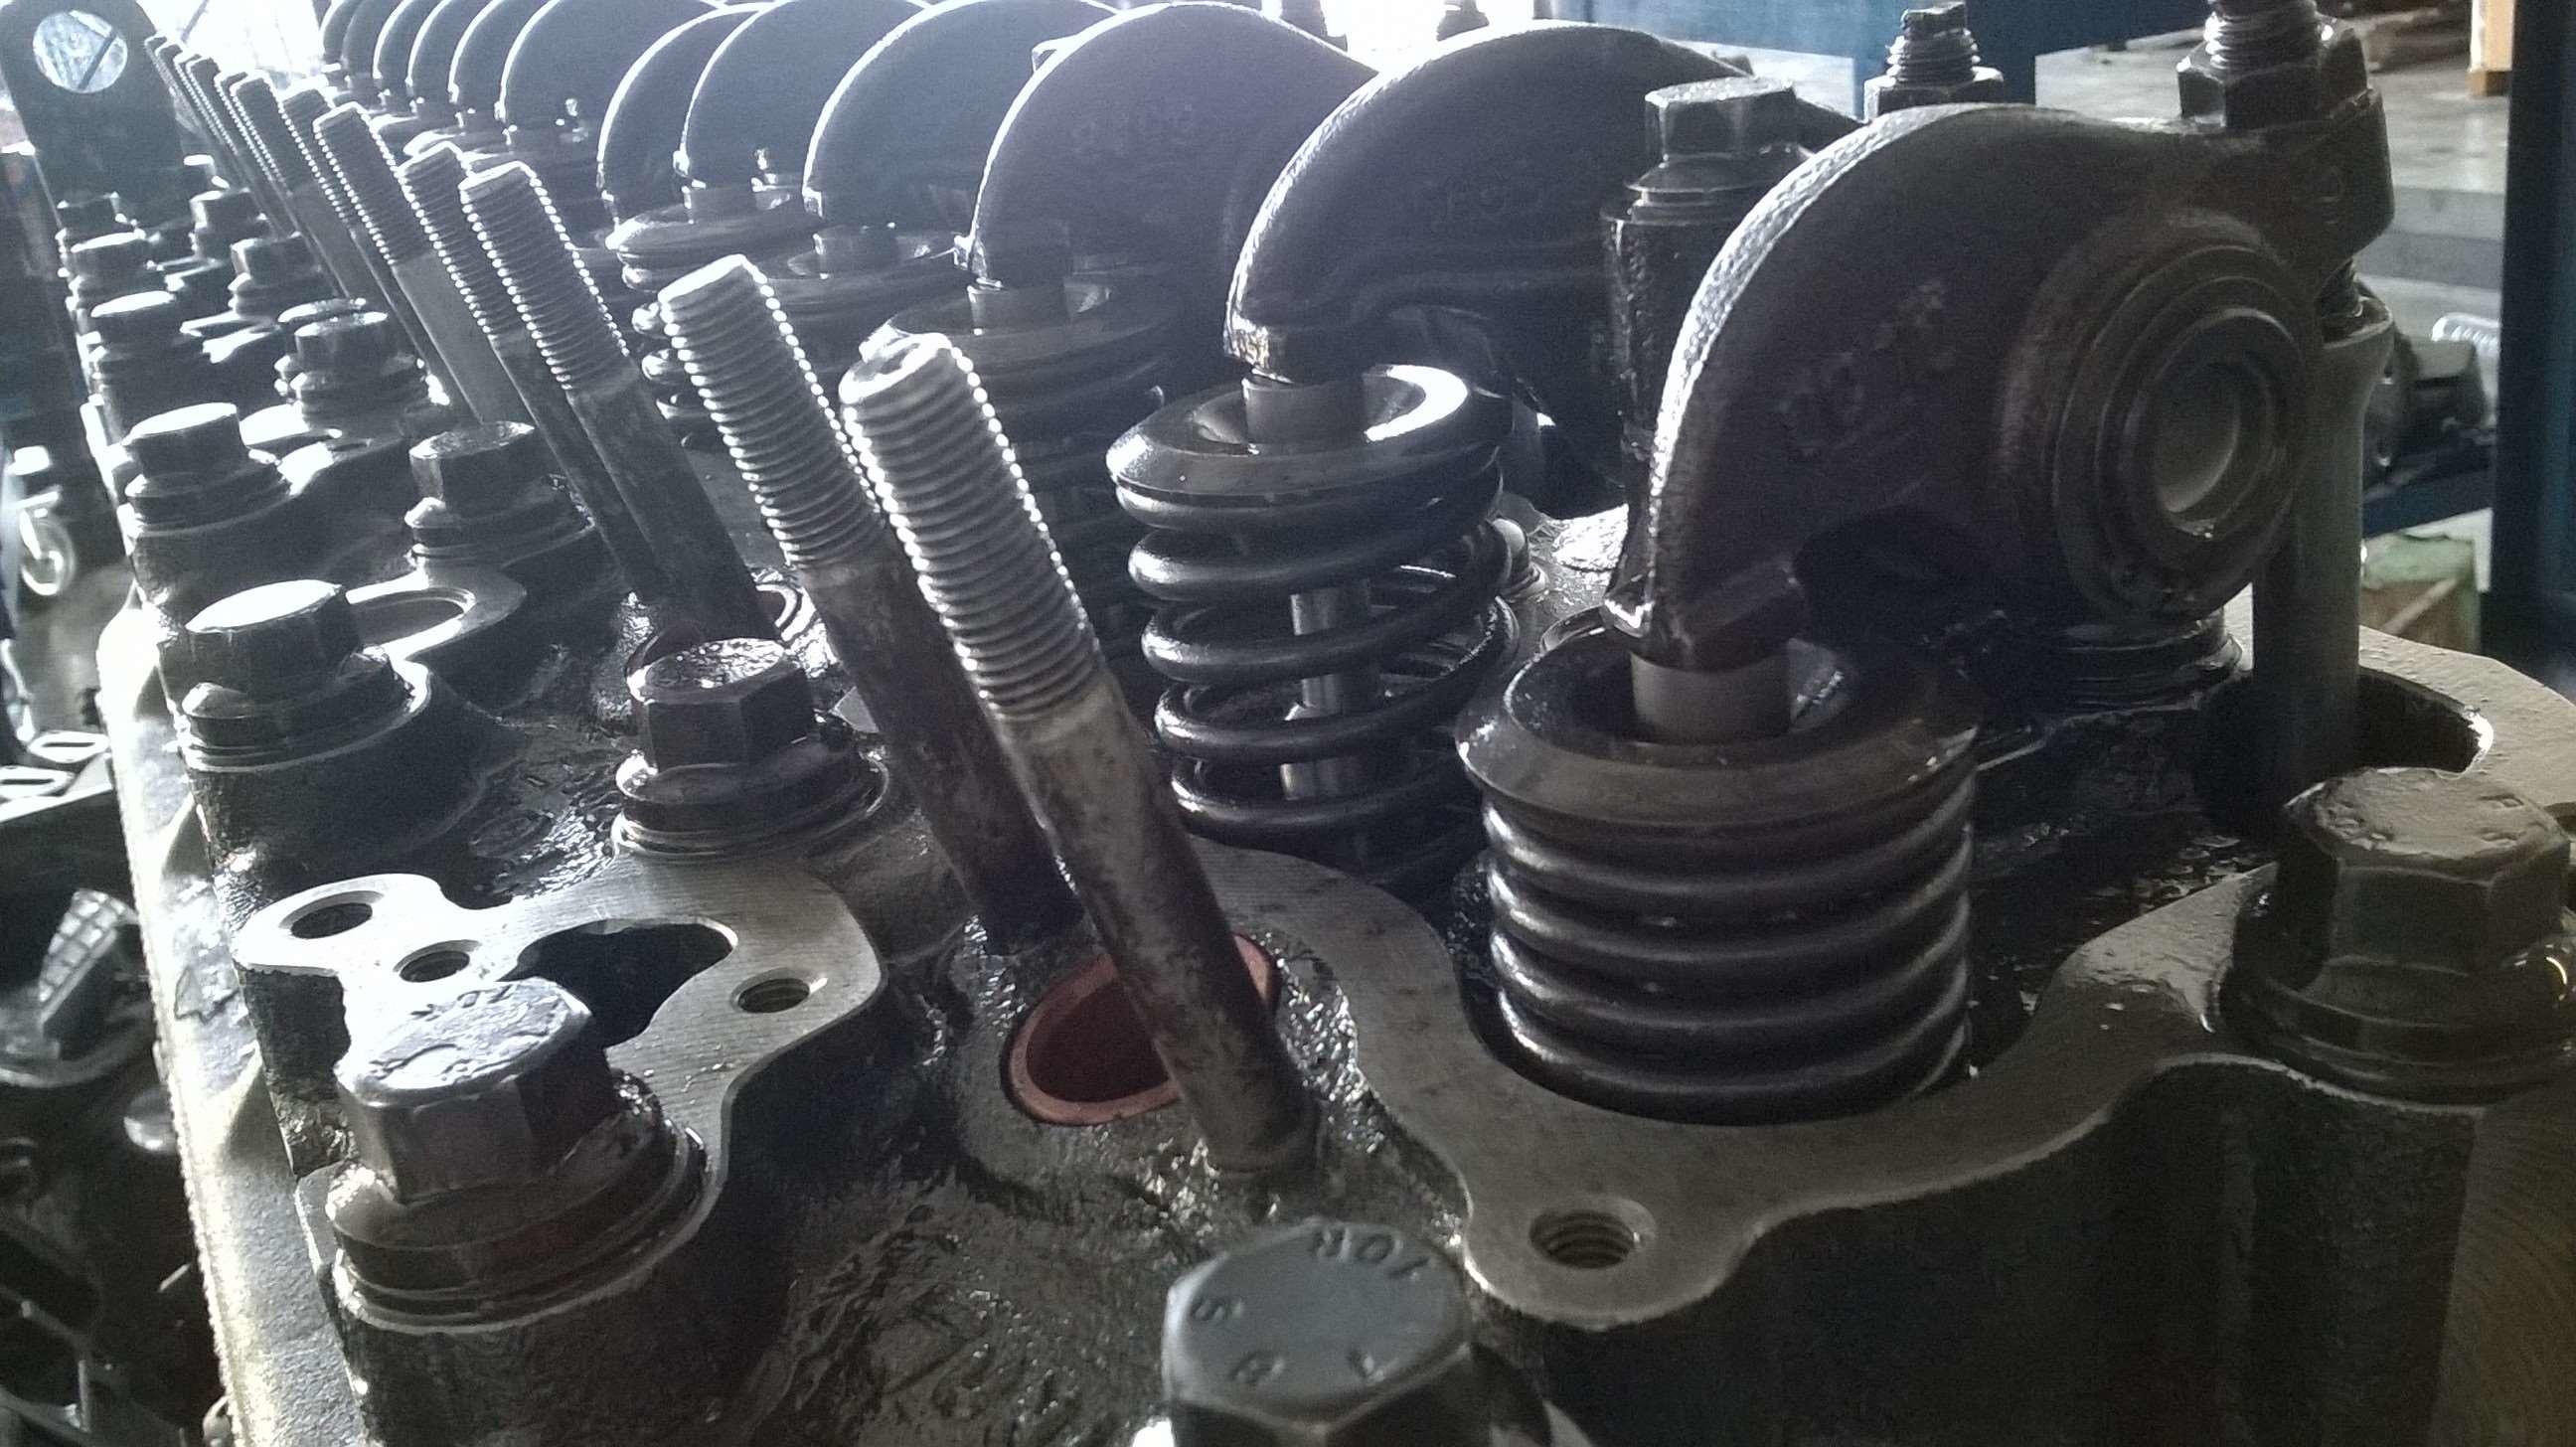 1920x1080 Mechanical gears wallpaper hd - photo#25